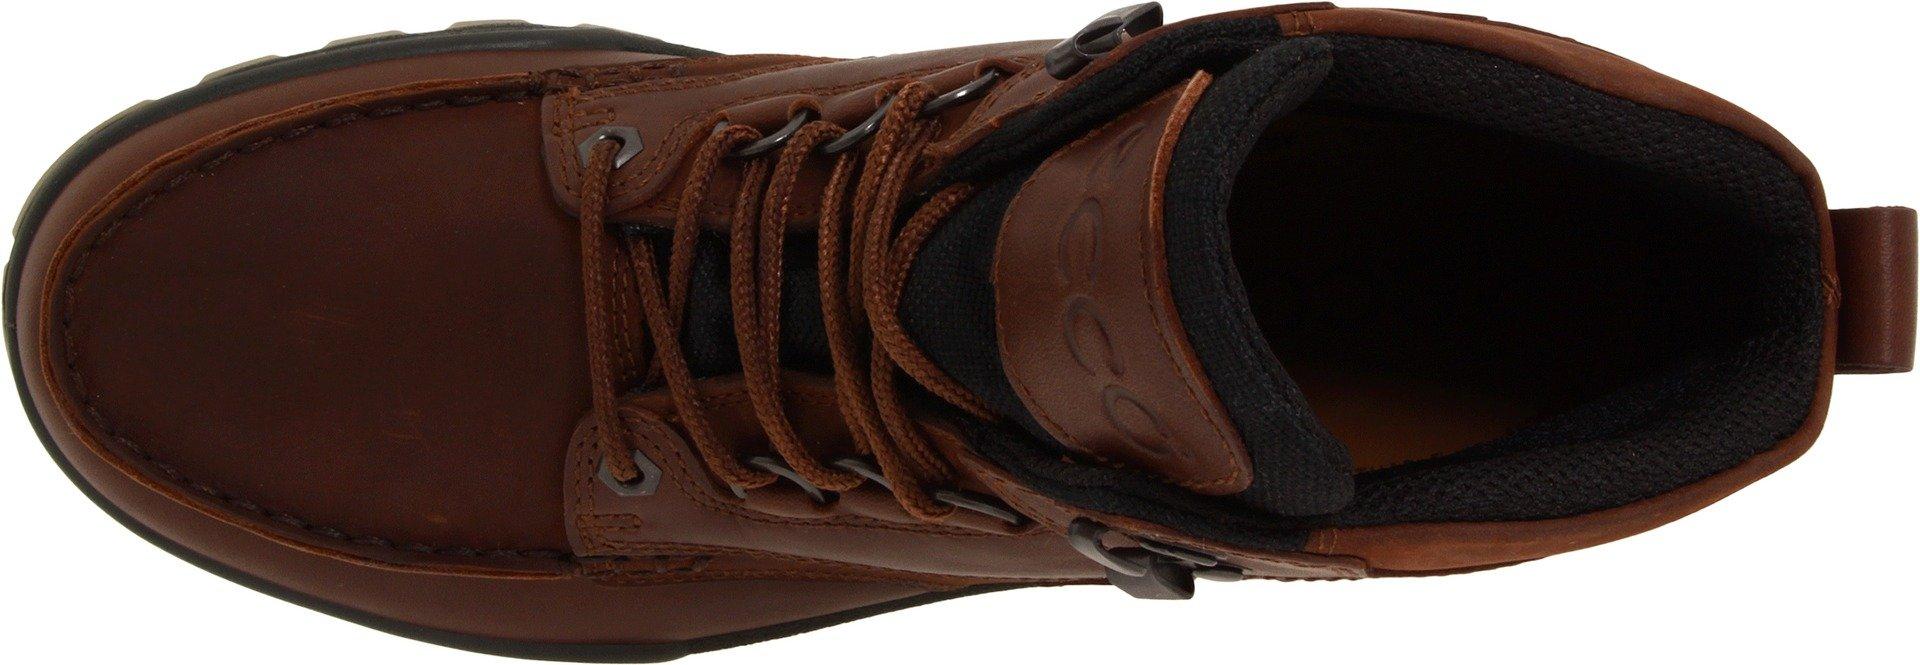 ECCO Men's Track II Mid Gore-Tex Boot,Bison,49 EU (US Men's 15-15.5 M) by ECCO (Image #8)